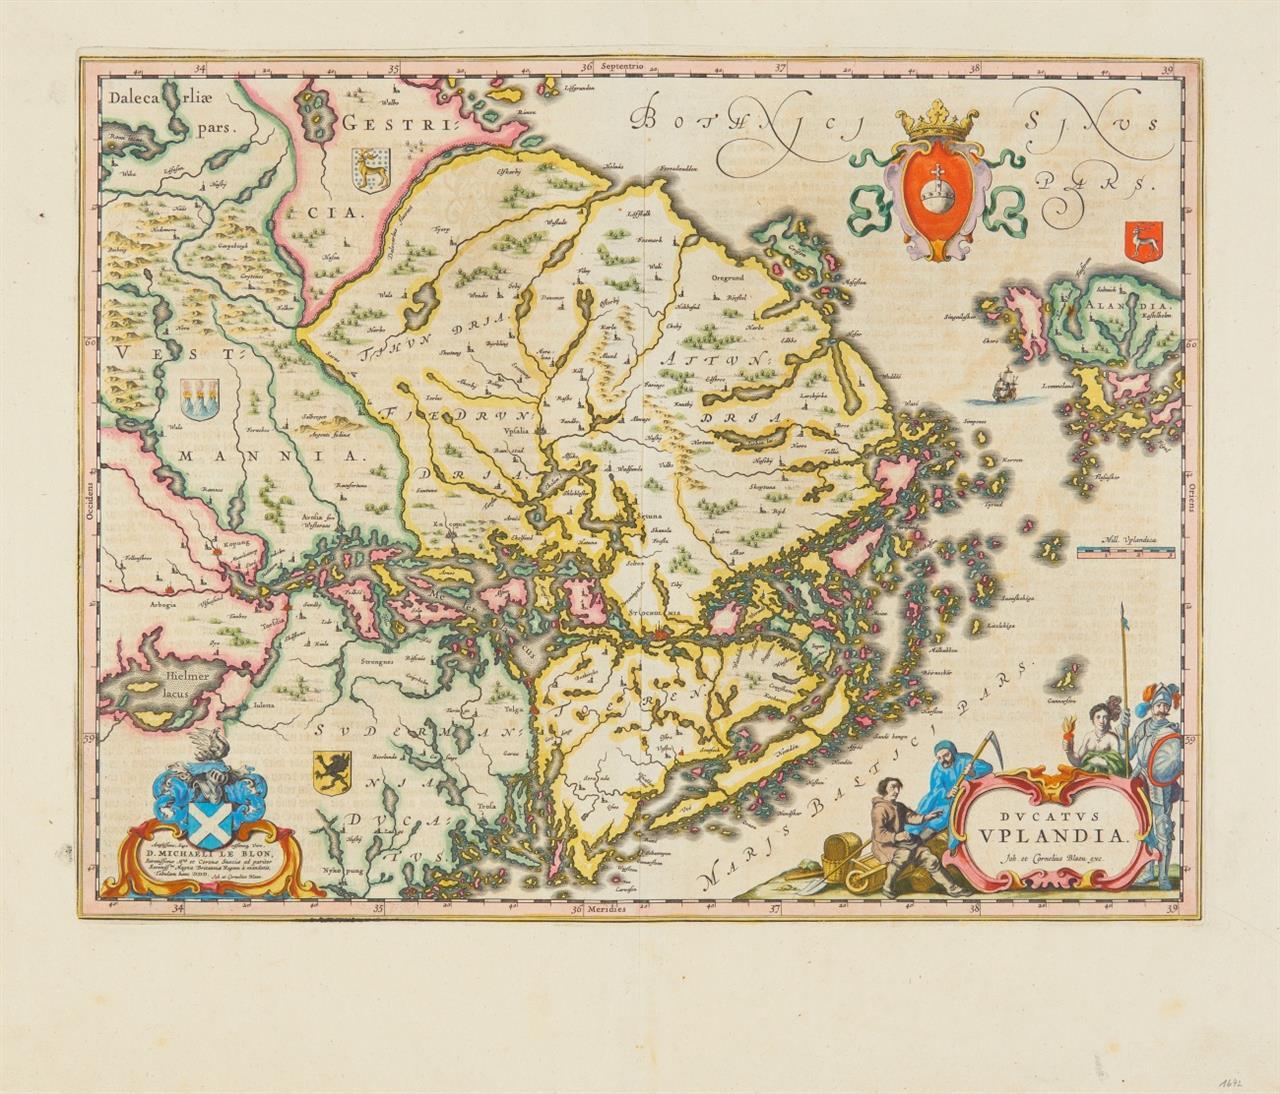 Uppland. Ducatus Uplandia. 1641-42. Kolor. Kupferstichkarte bei J. u. C. Blaeu.